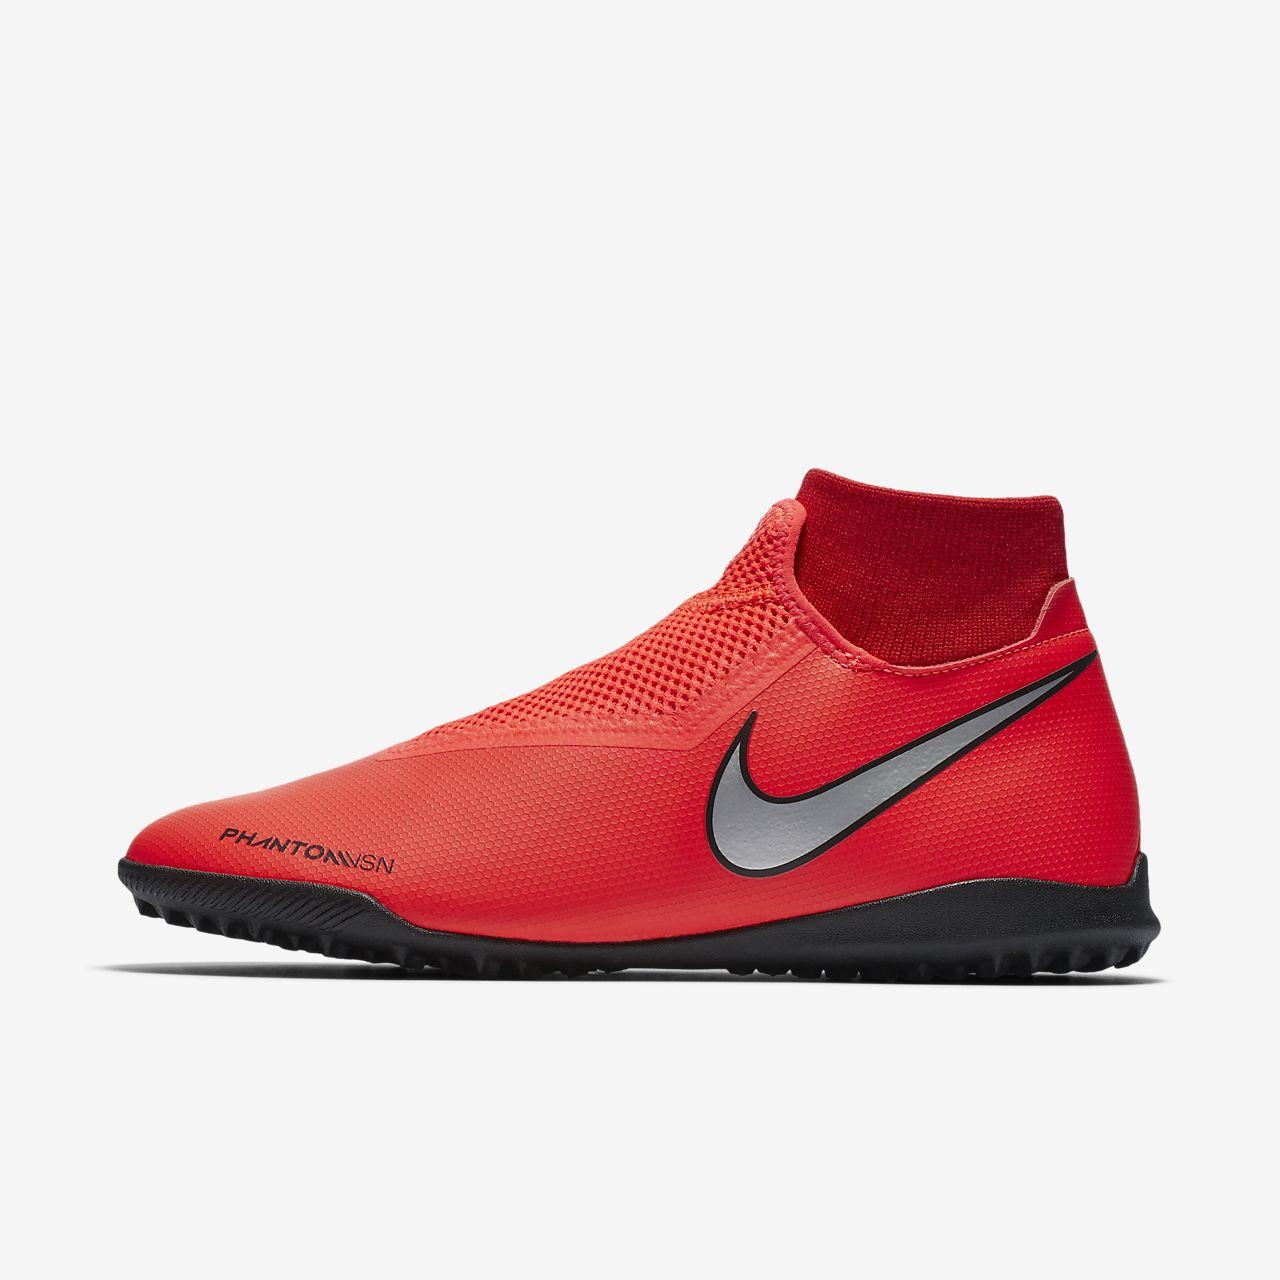 low priced 66e4d b2006 Nike Phantom Vision Academy Dynamic Fit TF